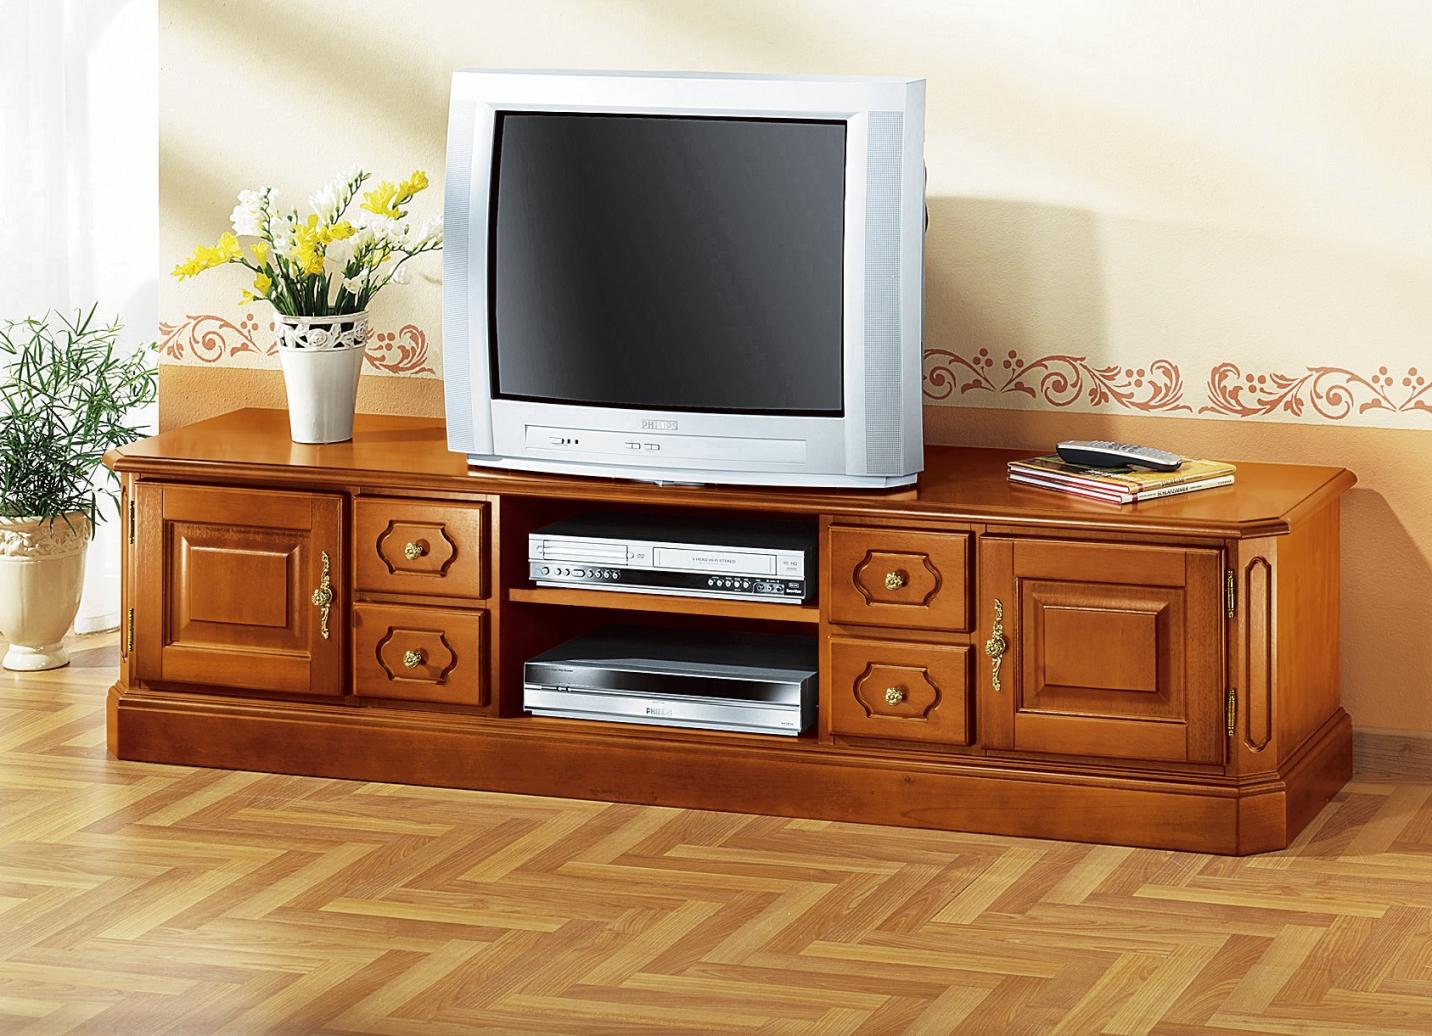 tv longboard hifi tv m bel brigitte hachenburg. Black Bedroom Furniture Sets. Home Design Ideas